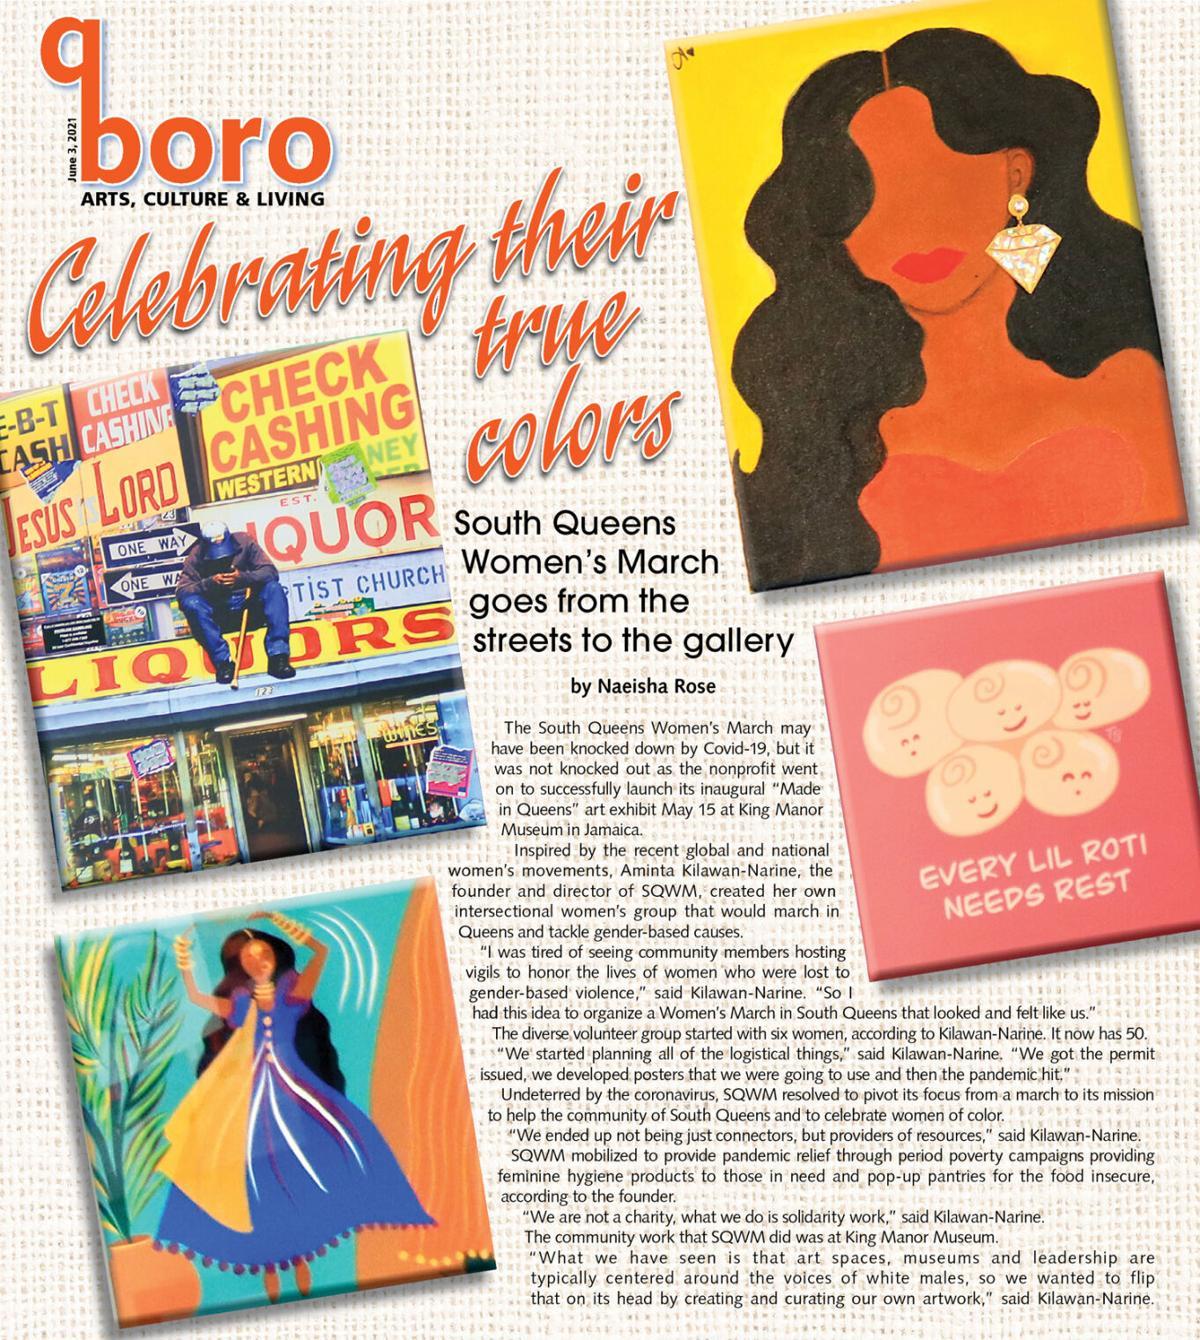 Nonprofit celebrates South Queens through art 1